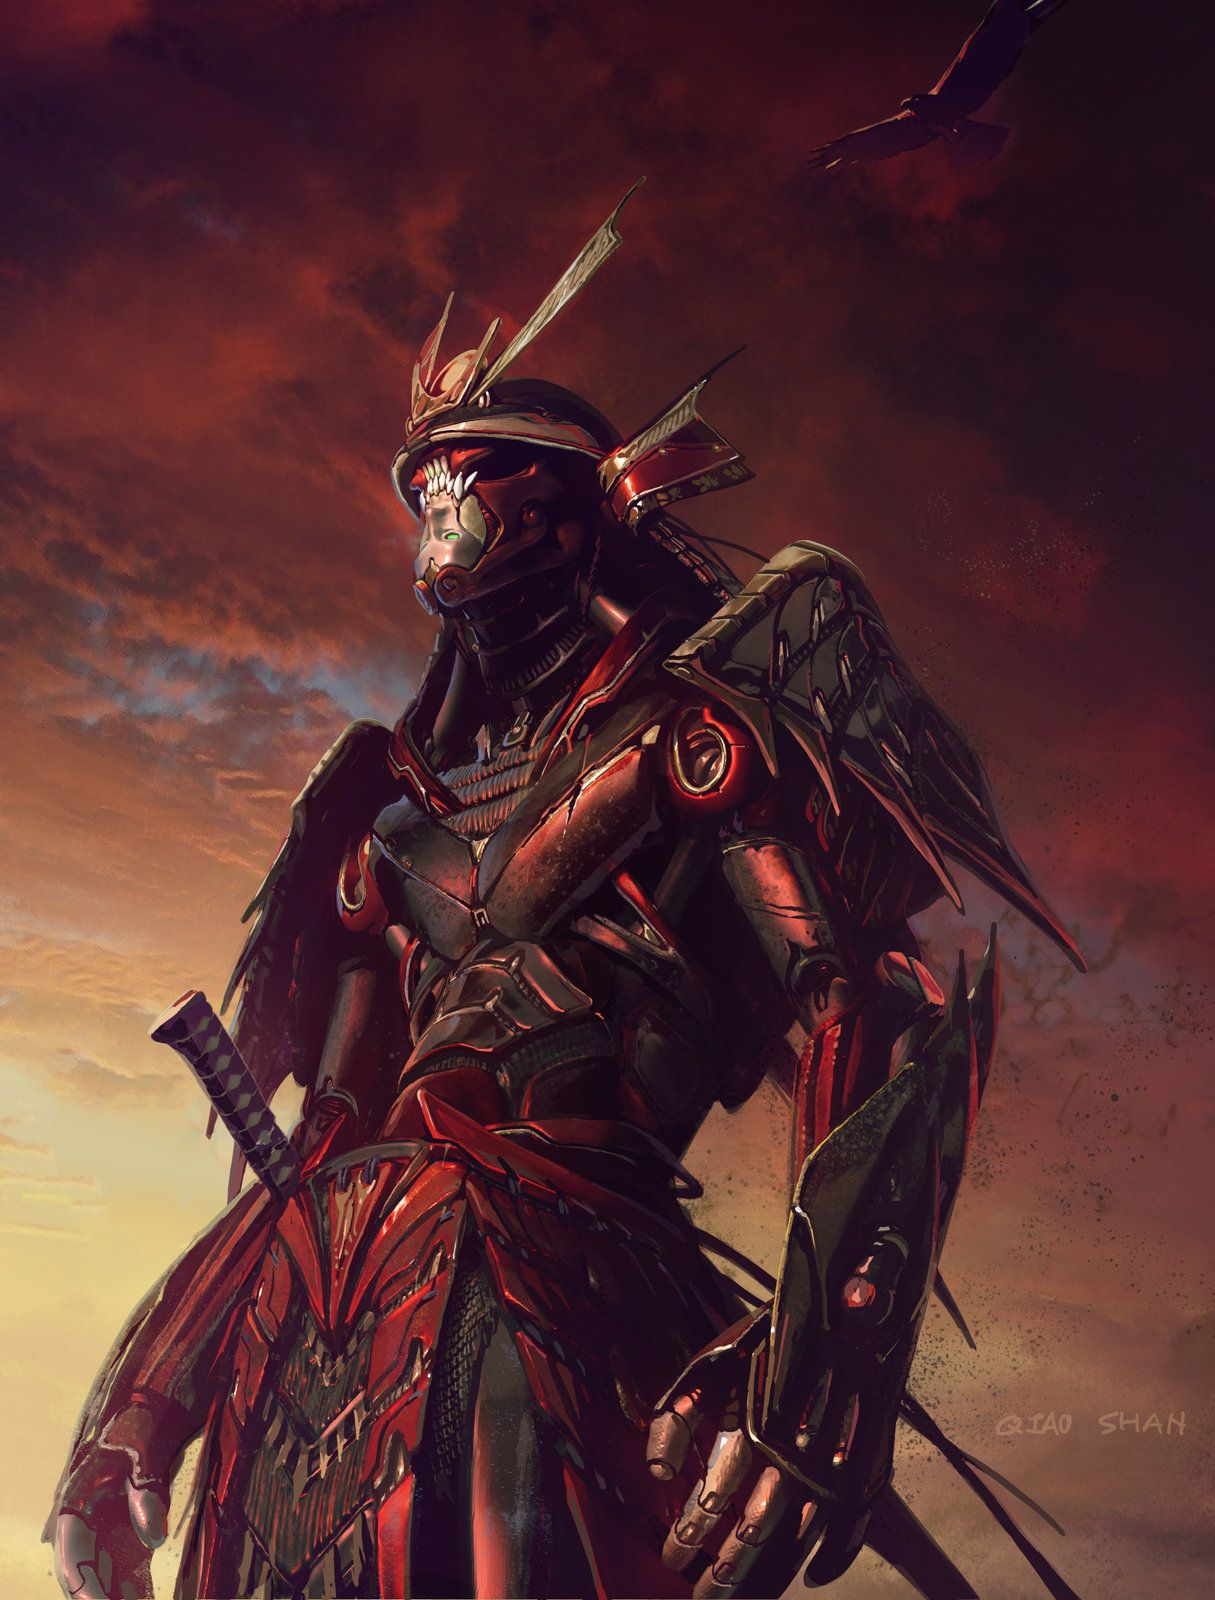 samurai rendering 2, Shan Qiao on ArtStation at https